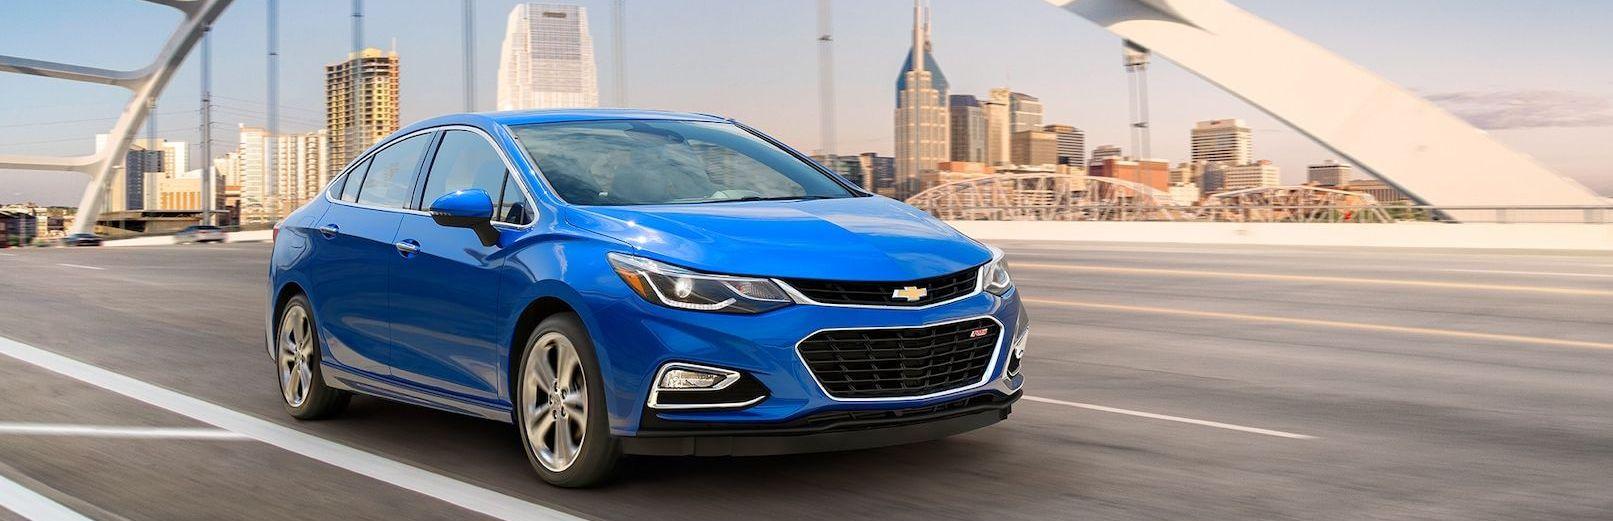 2018 Chevrolet Cruze Financing near Worthington, MD